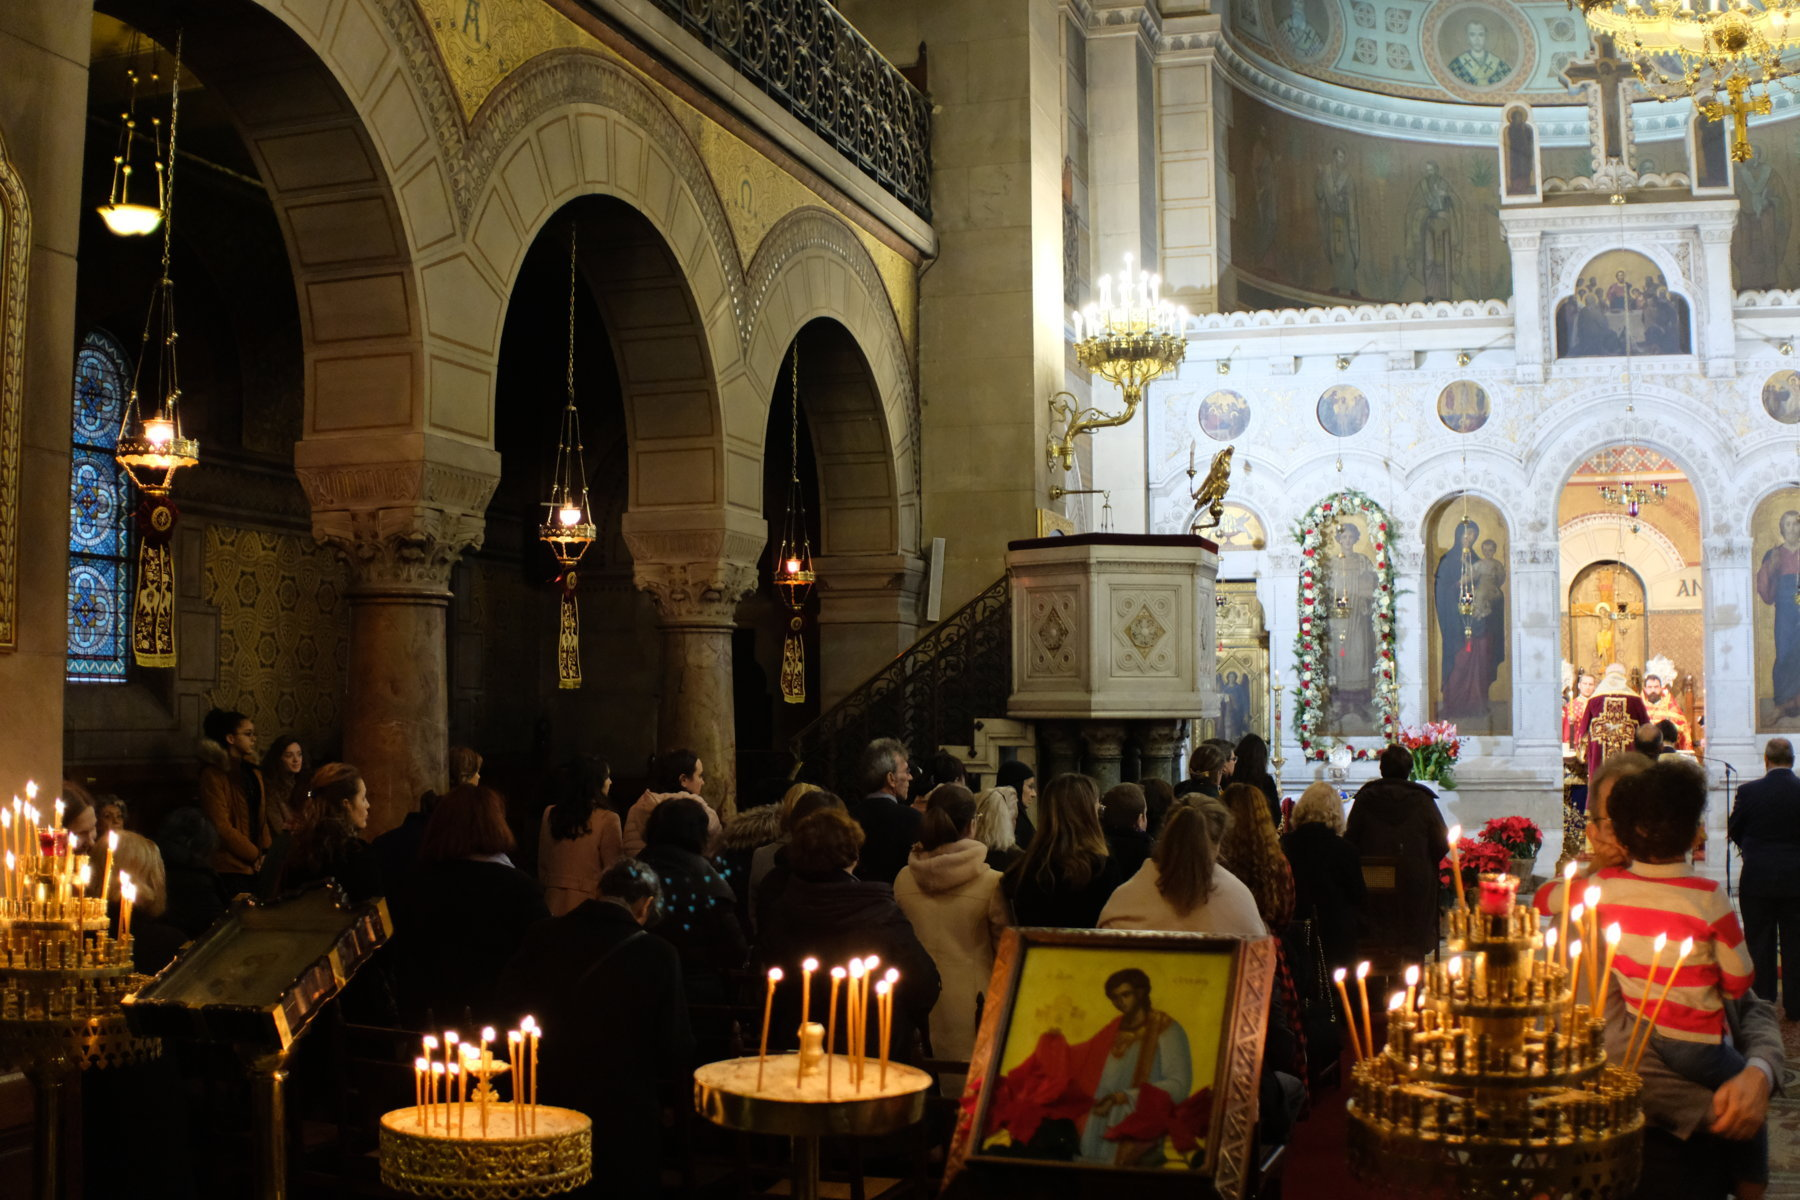 DSCF2895 - Πολυαρχιερατική Θεία Λειτουργία στο Παρίσι (φωτο)